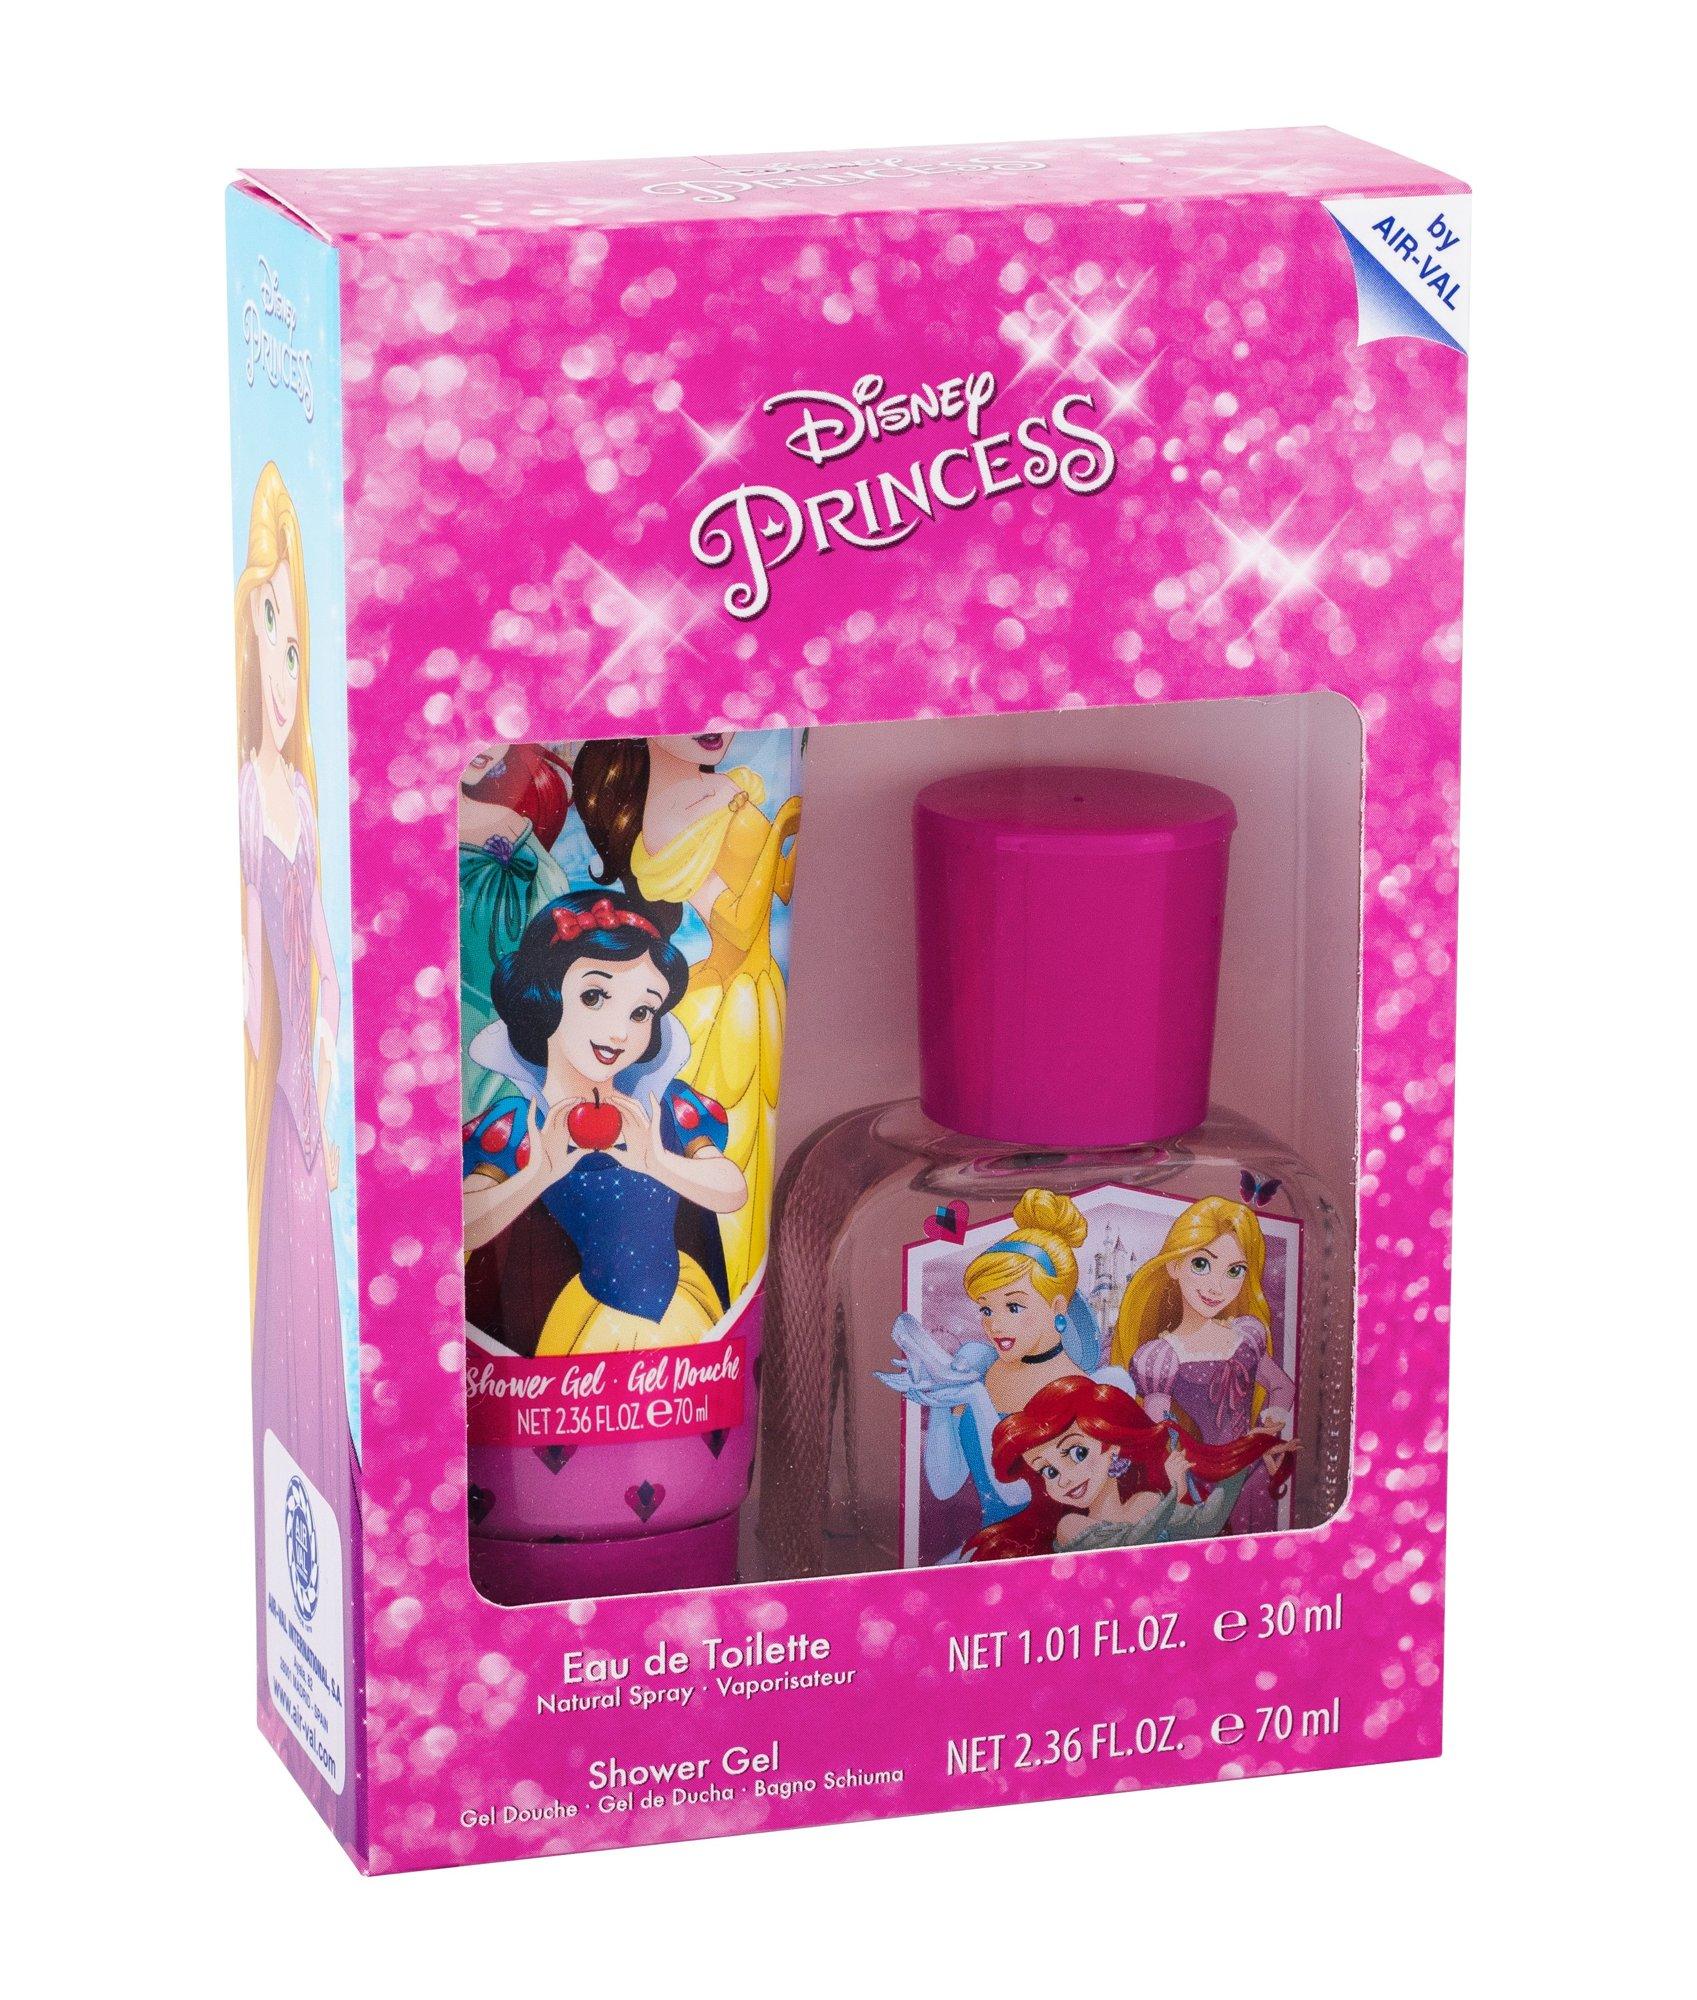 Disney Princess Princess Eau de Toilette 30ml